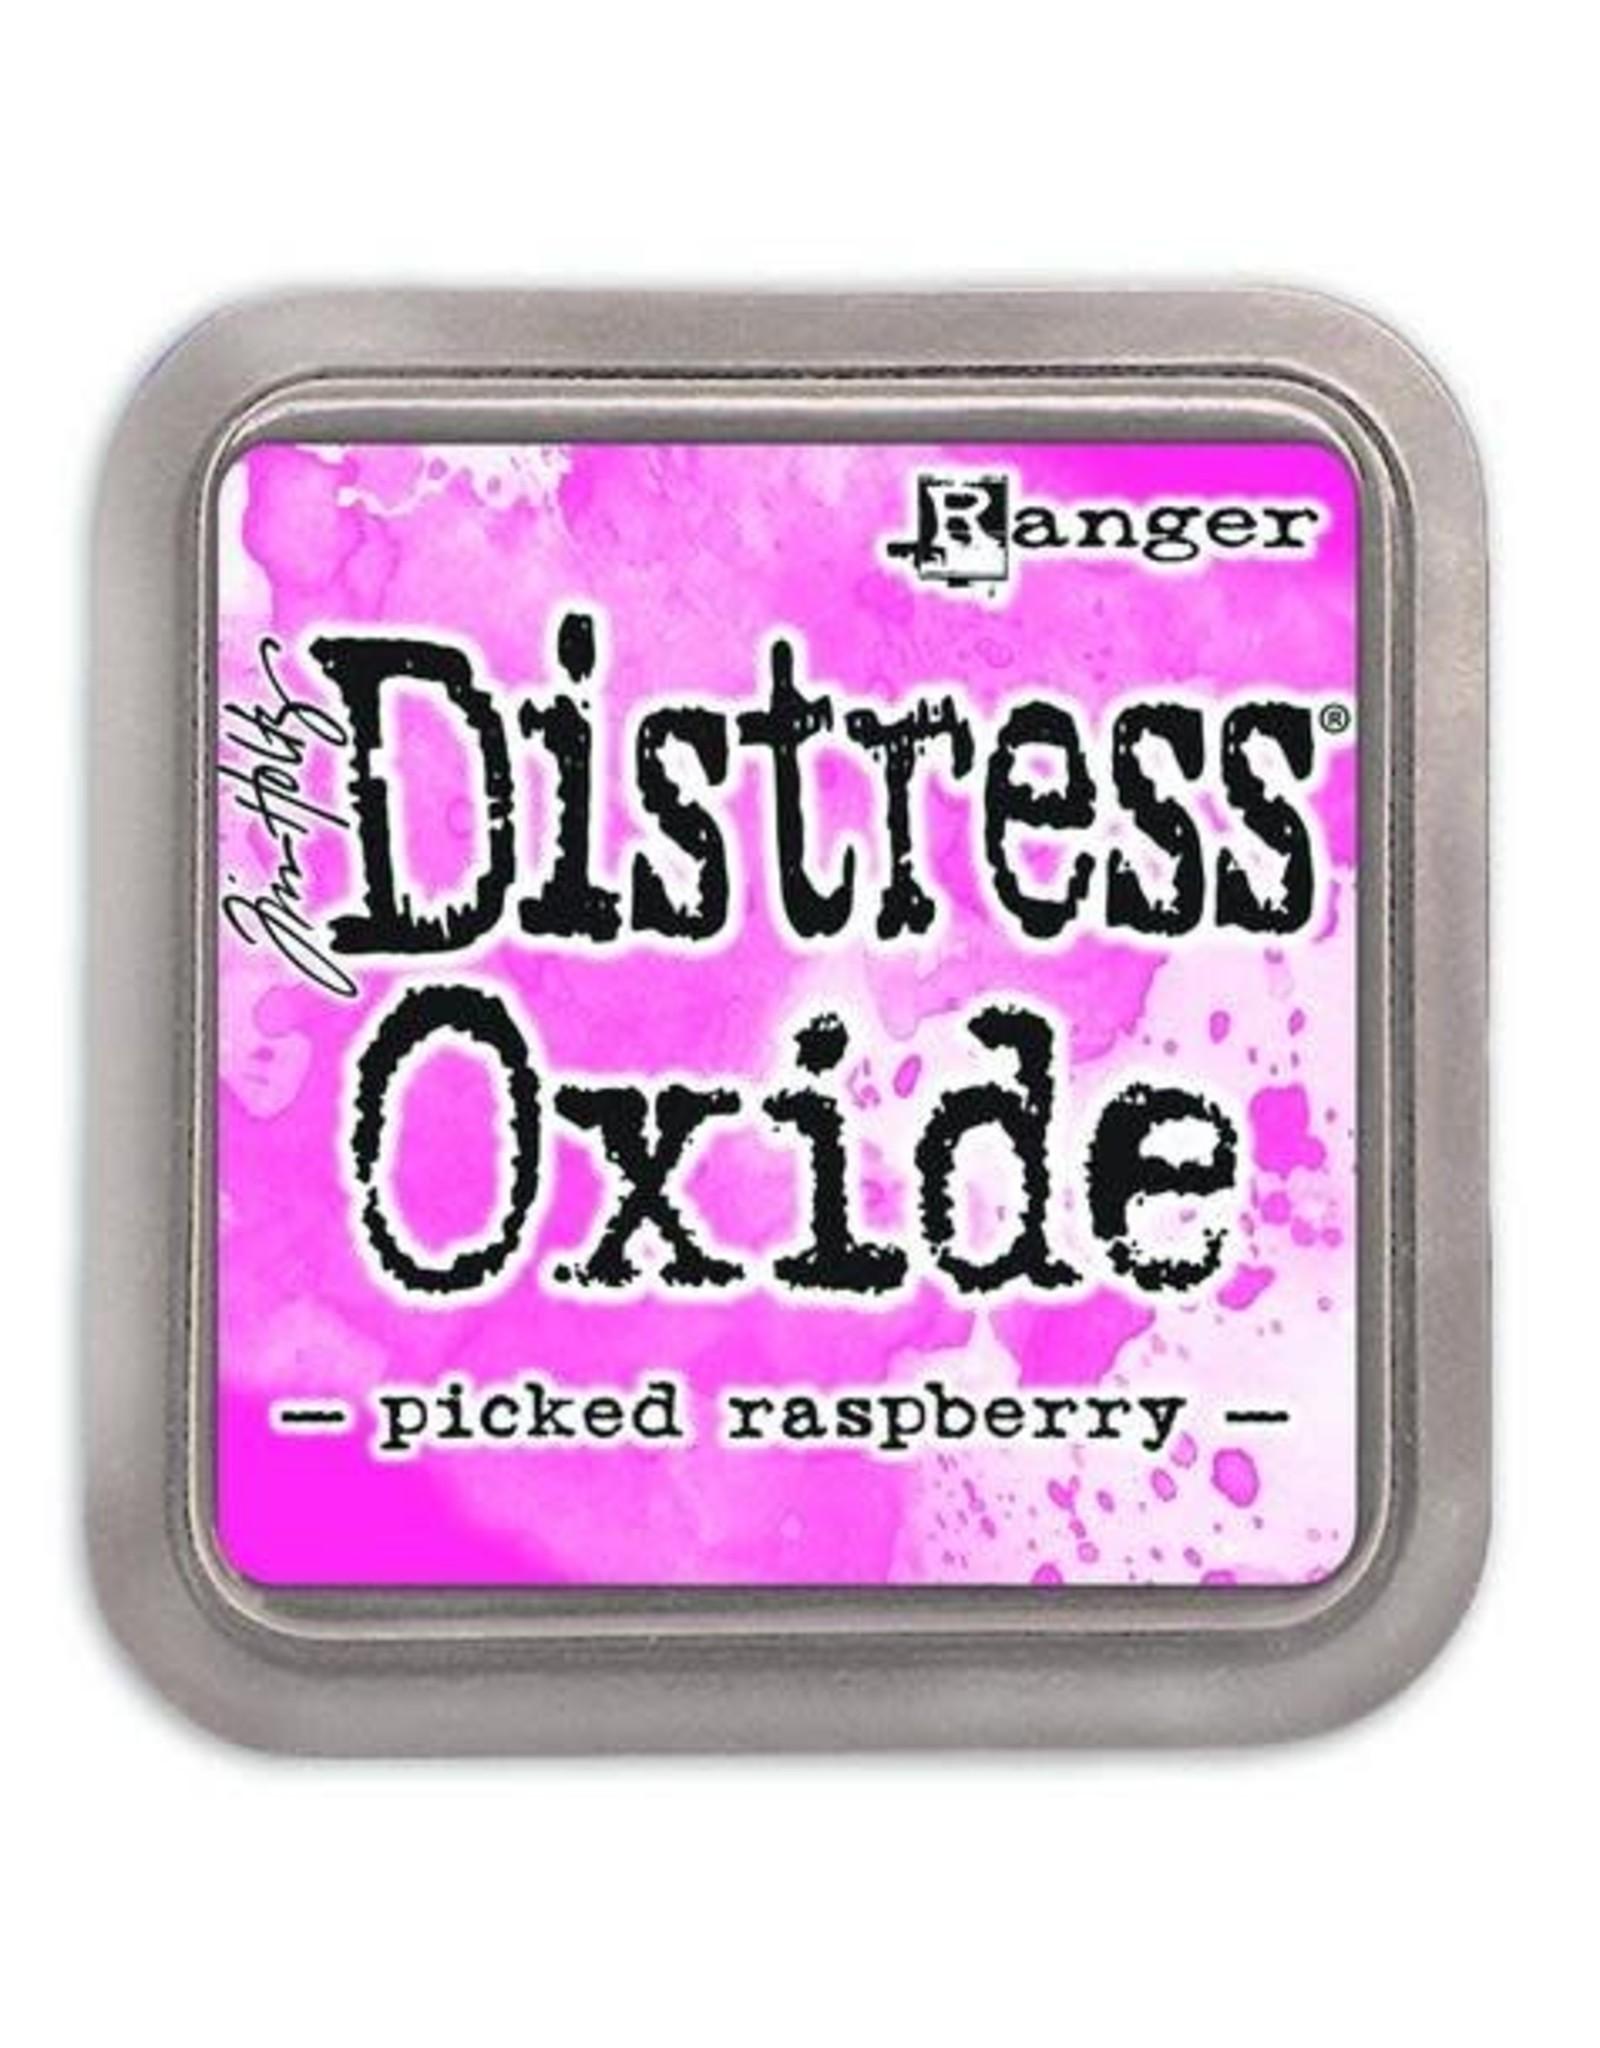 Ranger Distress Oxide Ranger Distress Oxide - picked raspberry TDO56126 Tim Holtz